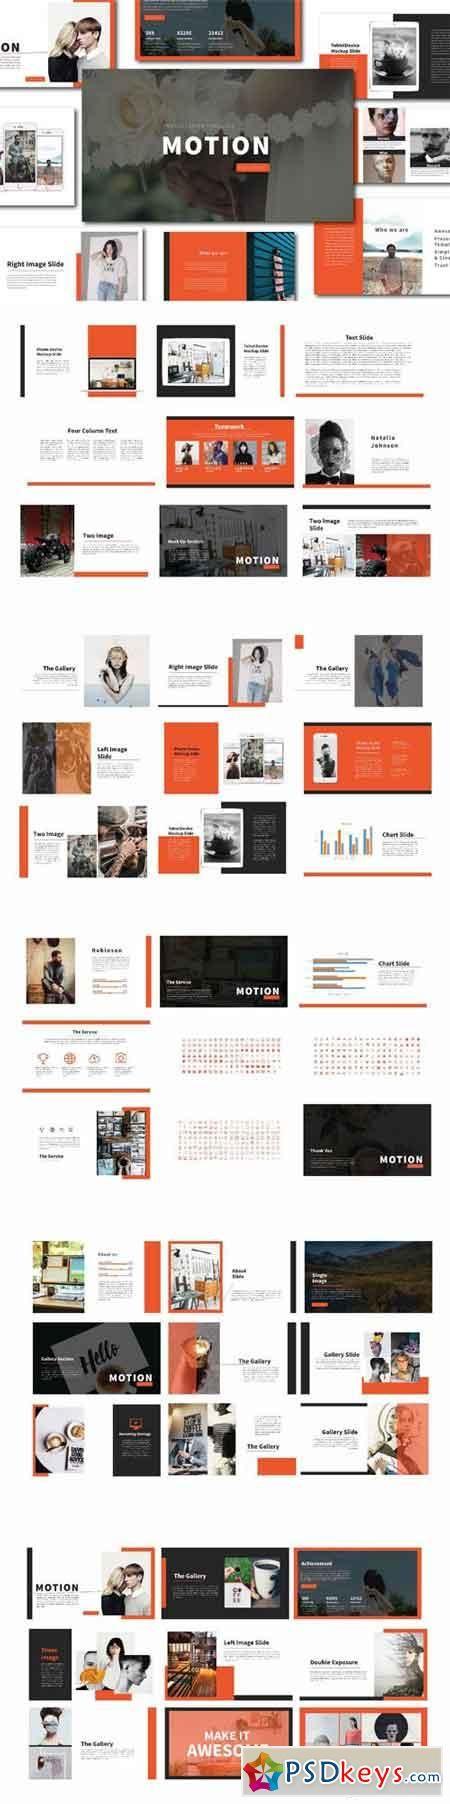 Motion Powerpoint Template Brochures Pinterest Template